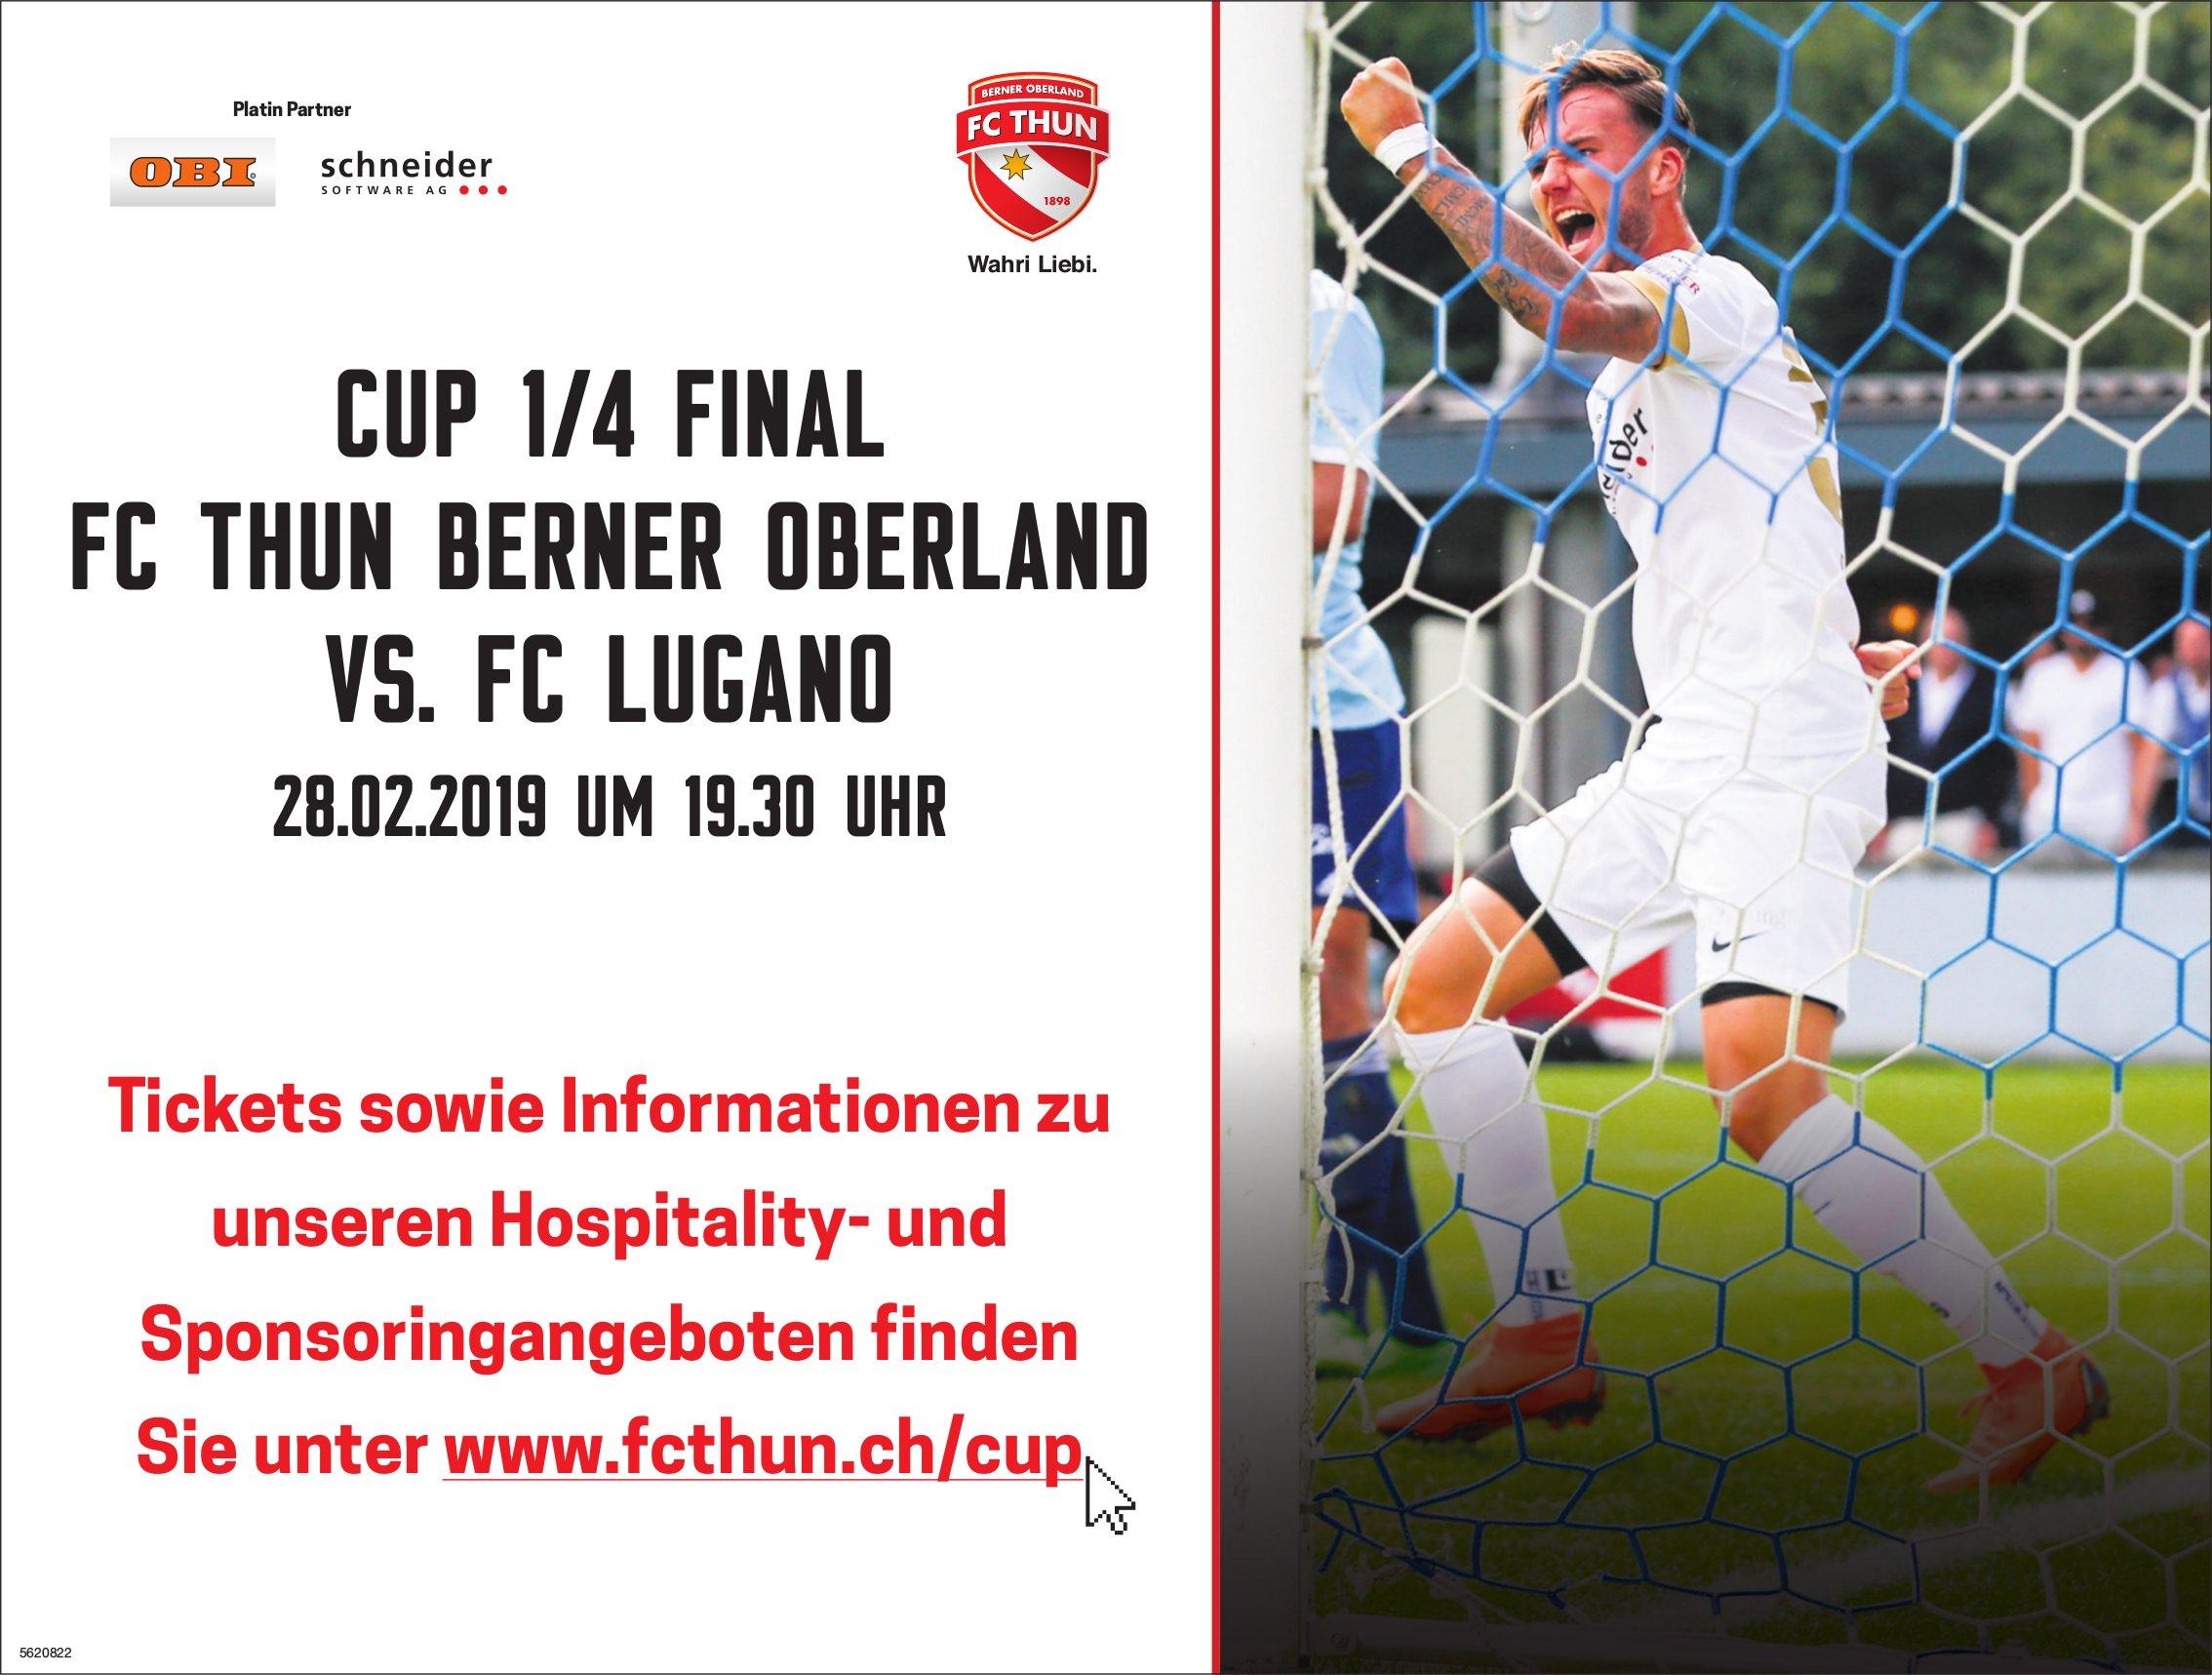 Cup 1/4 Final FC Thun Berner Oberland vs. FC Lugano am 28. Februar